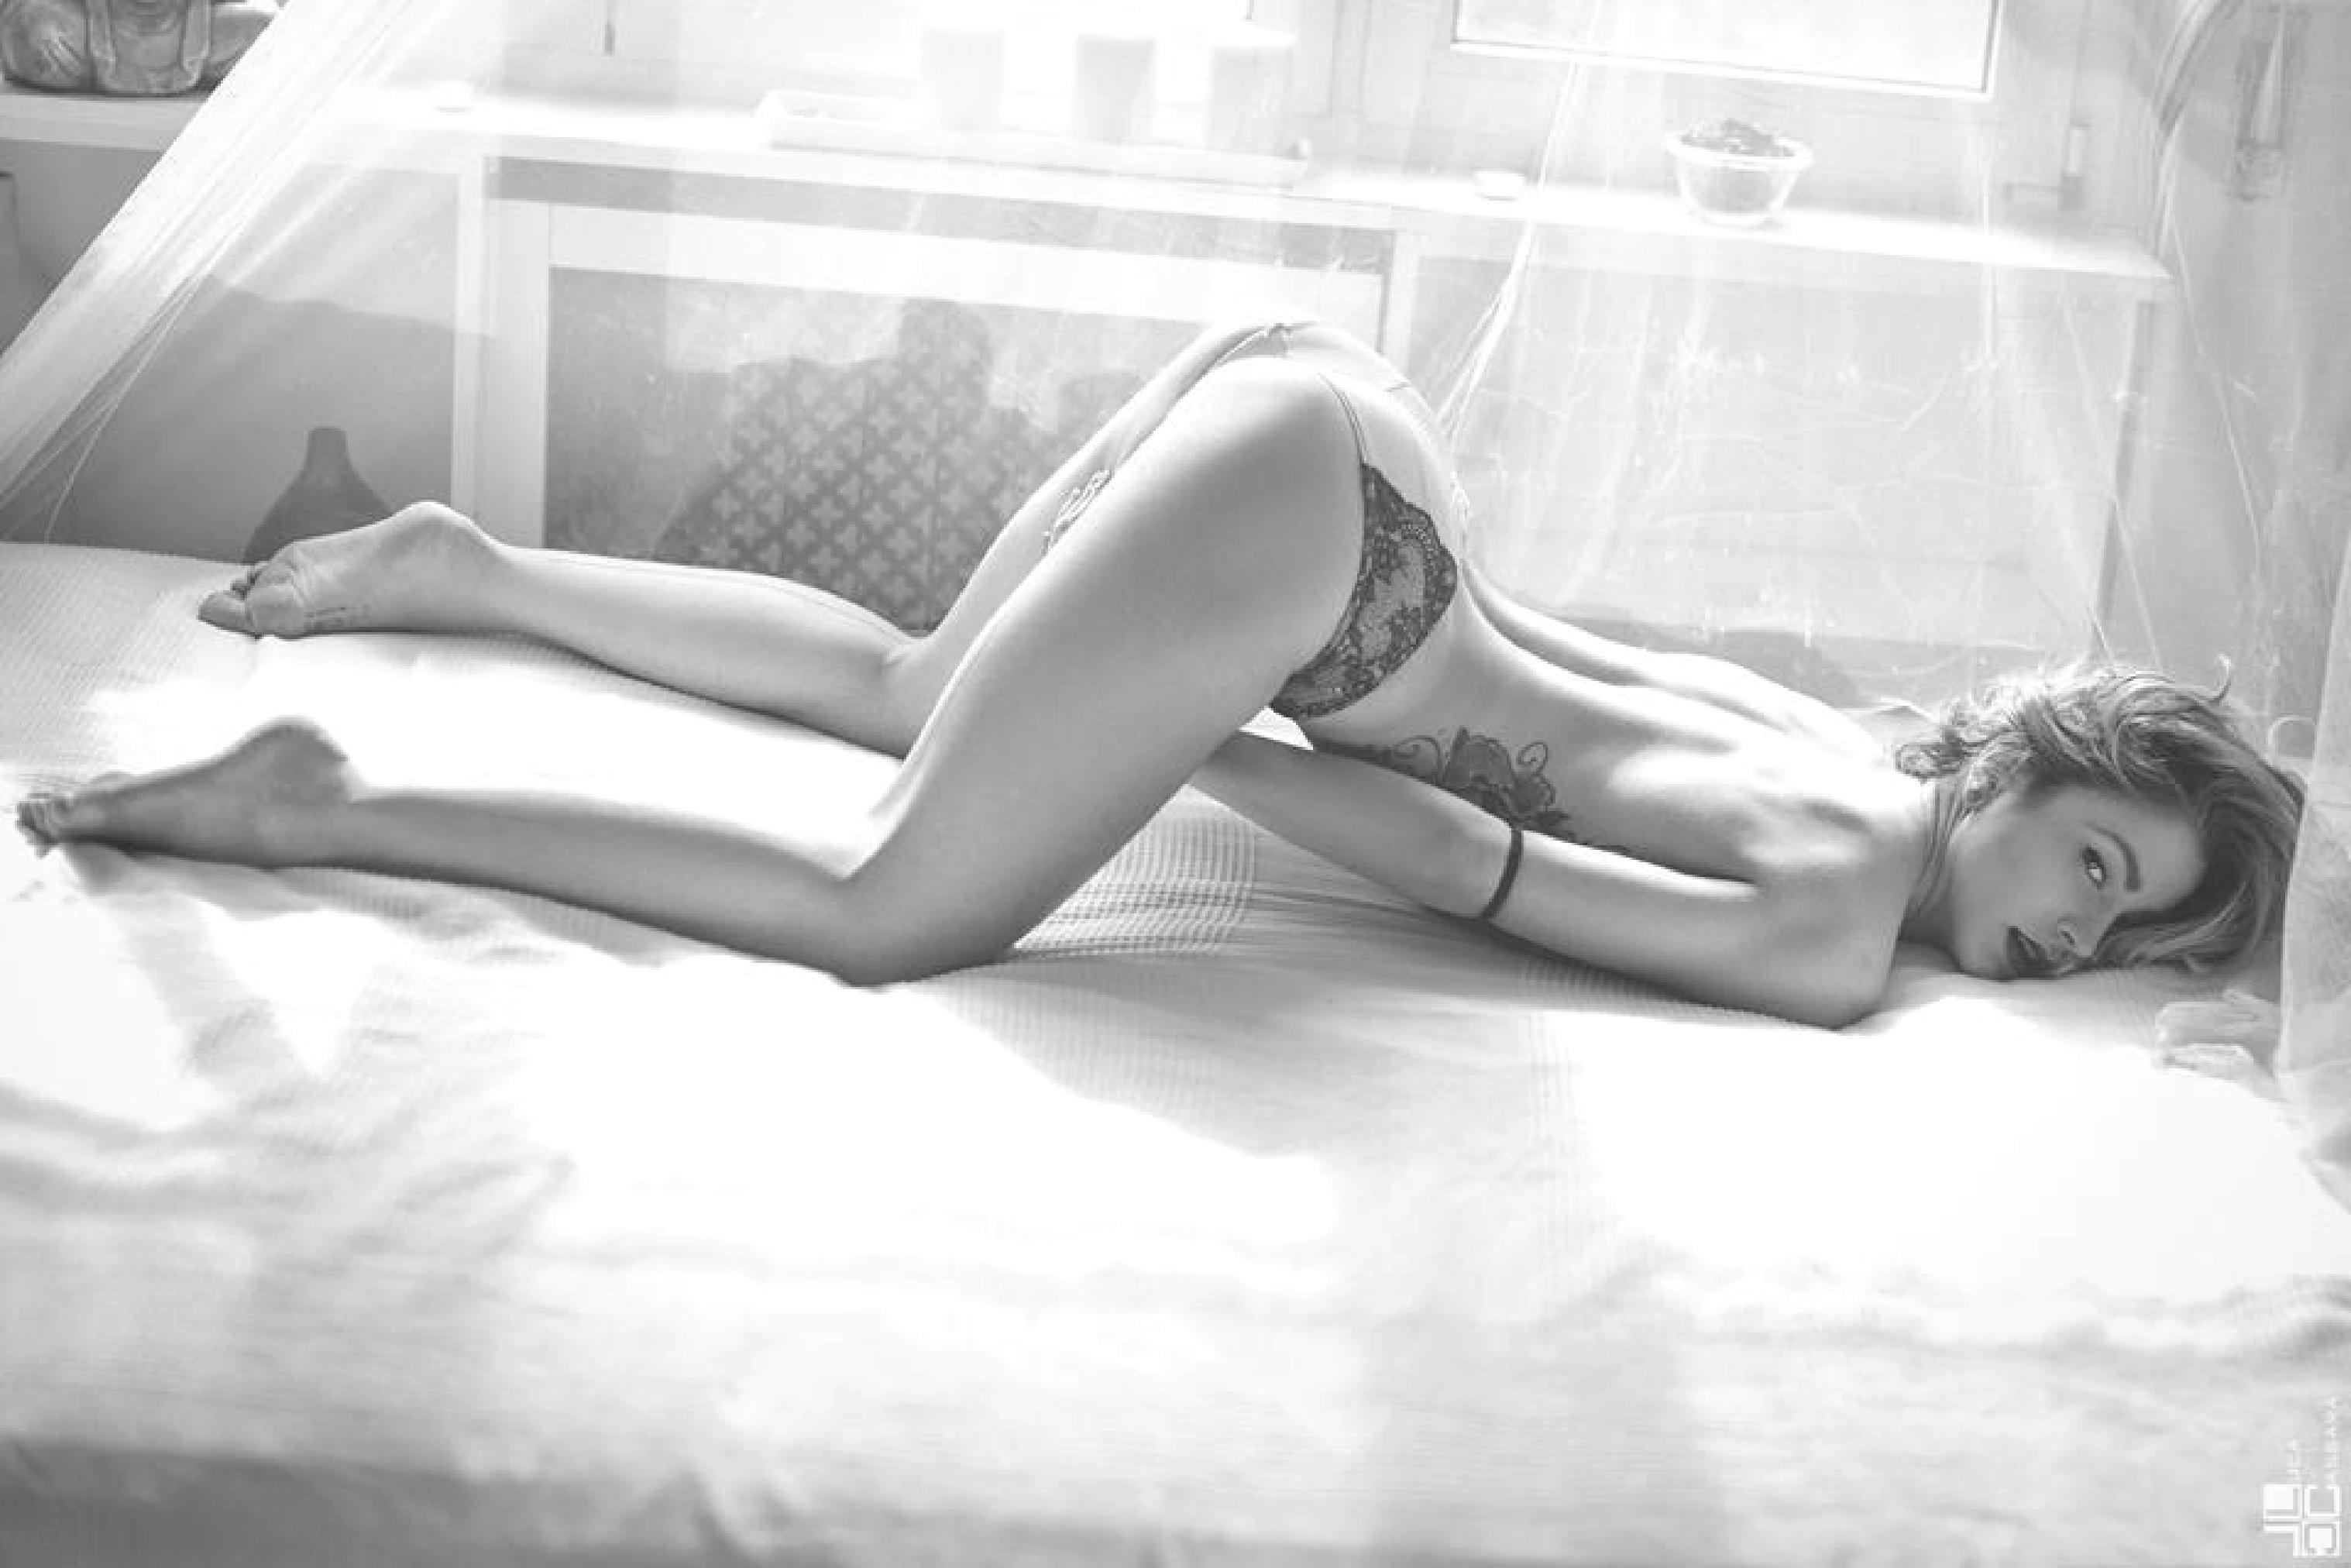 Stella Di Plastica nudes (27 photos), foto Topless, iCloud, butt 2017